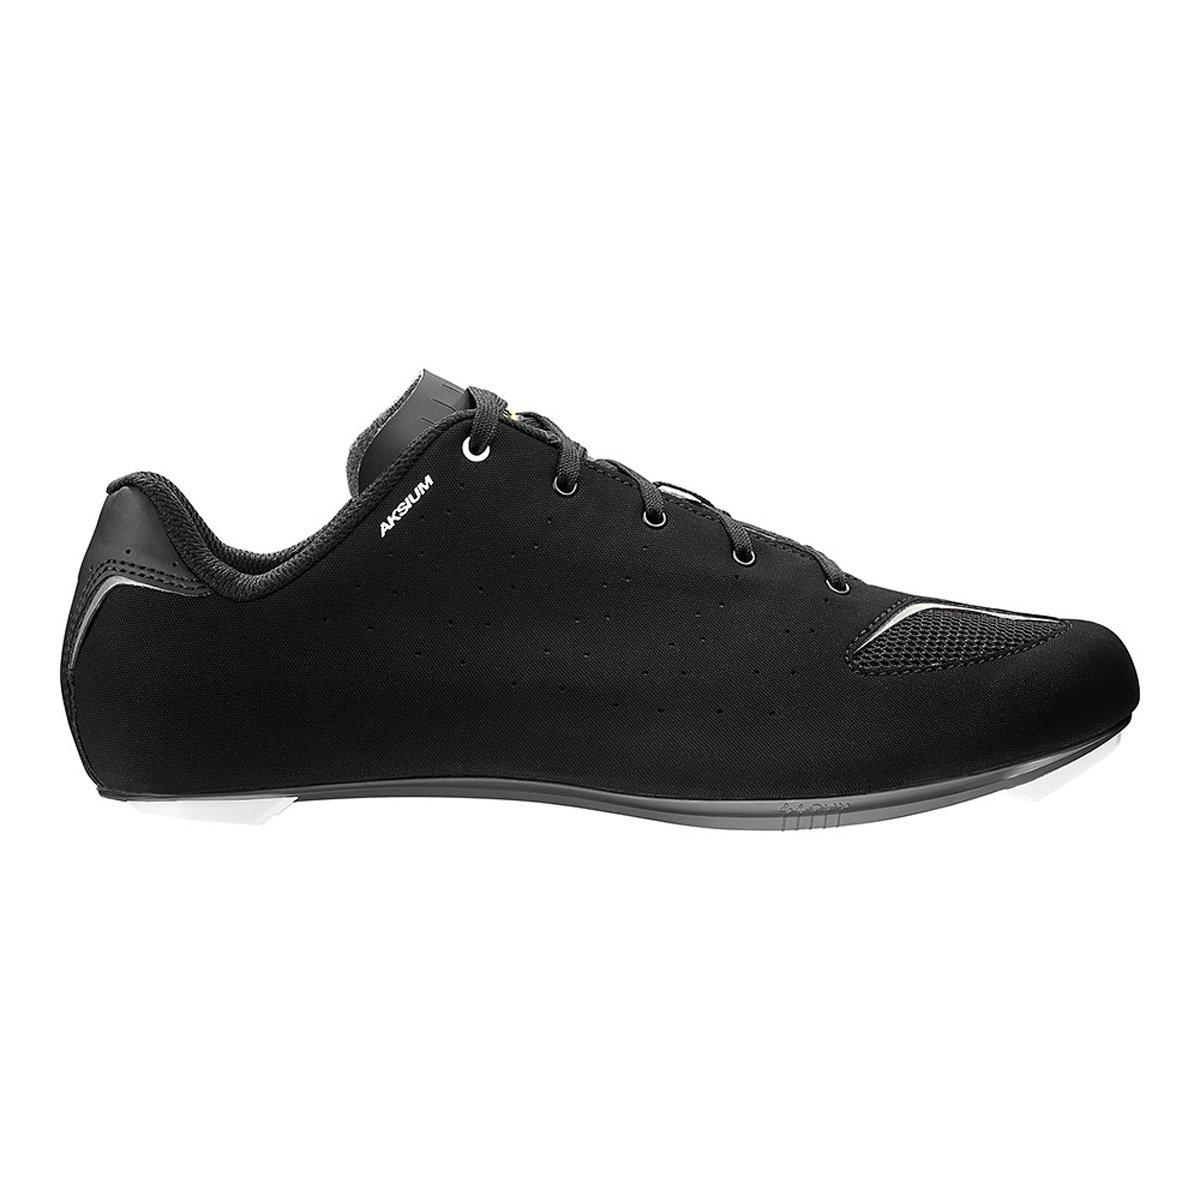 Mavic Aksium Road Cycling Shoe – Men 's B01LY02Q41 11 ブラック/ホワイト/ブラック